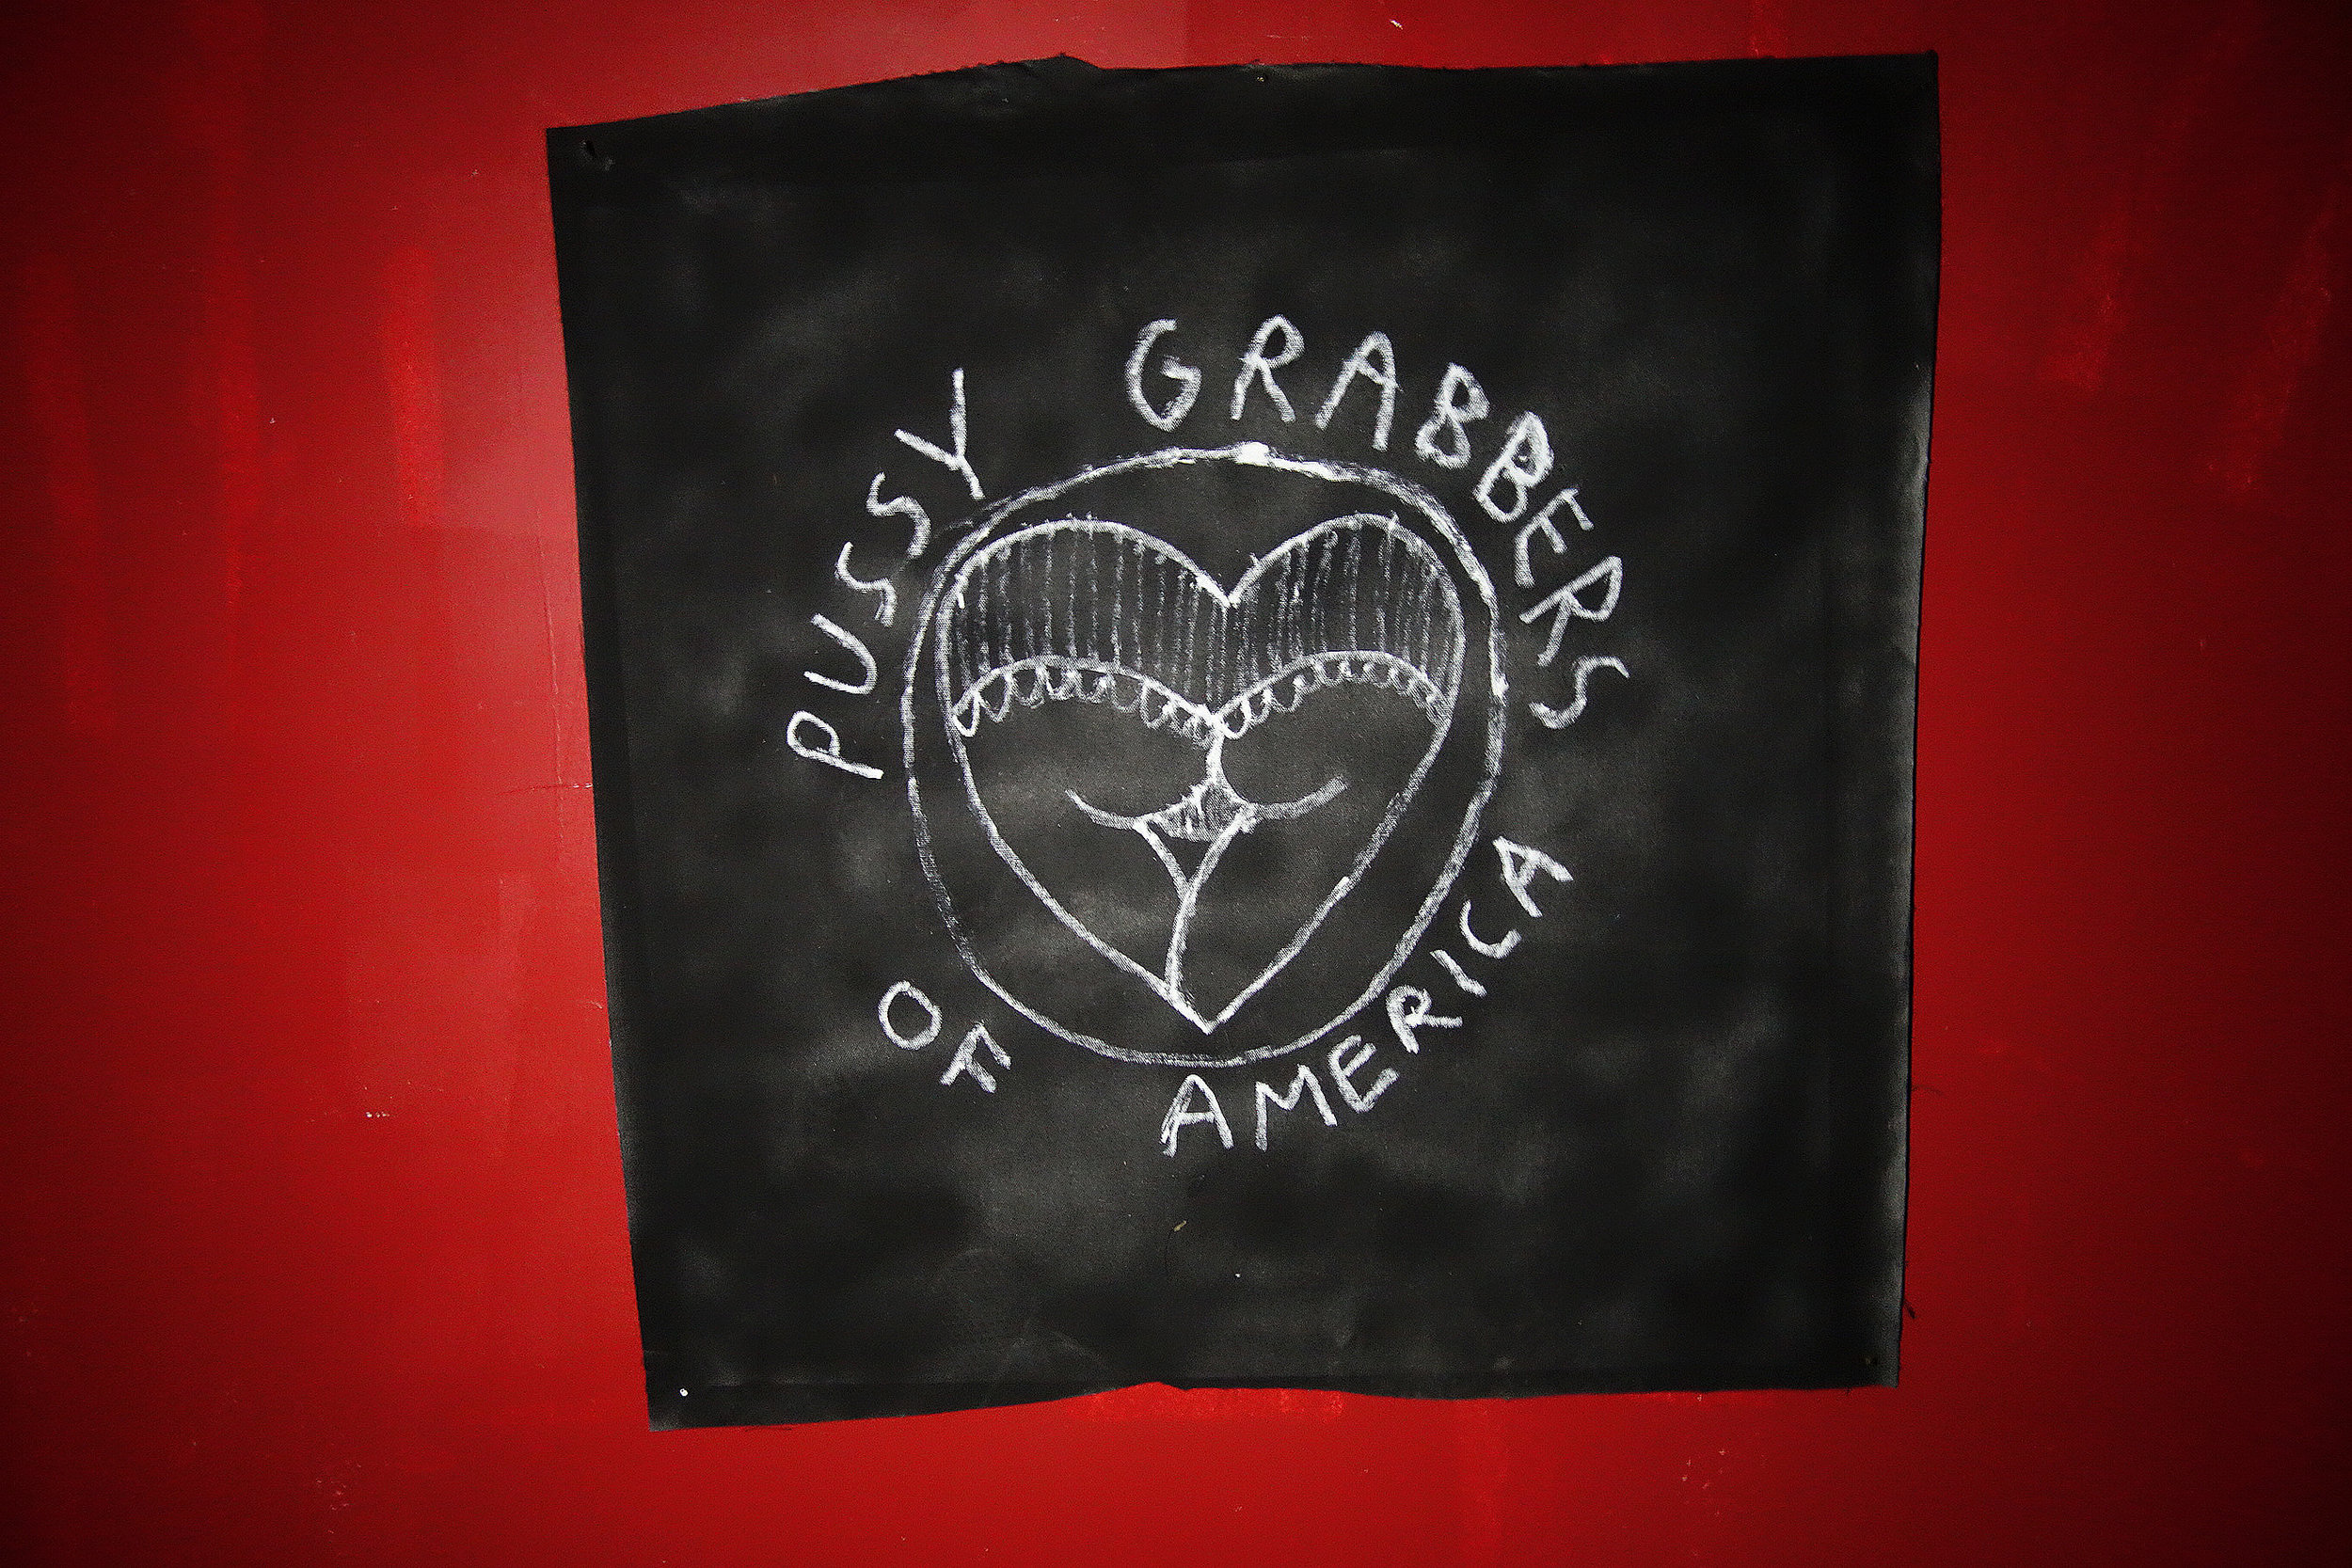 Pussy Grabbers Of America.jpg